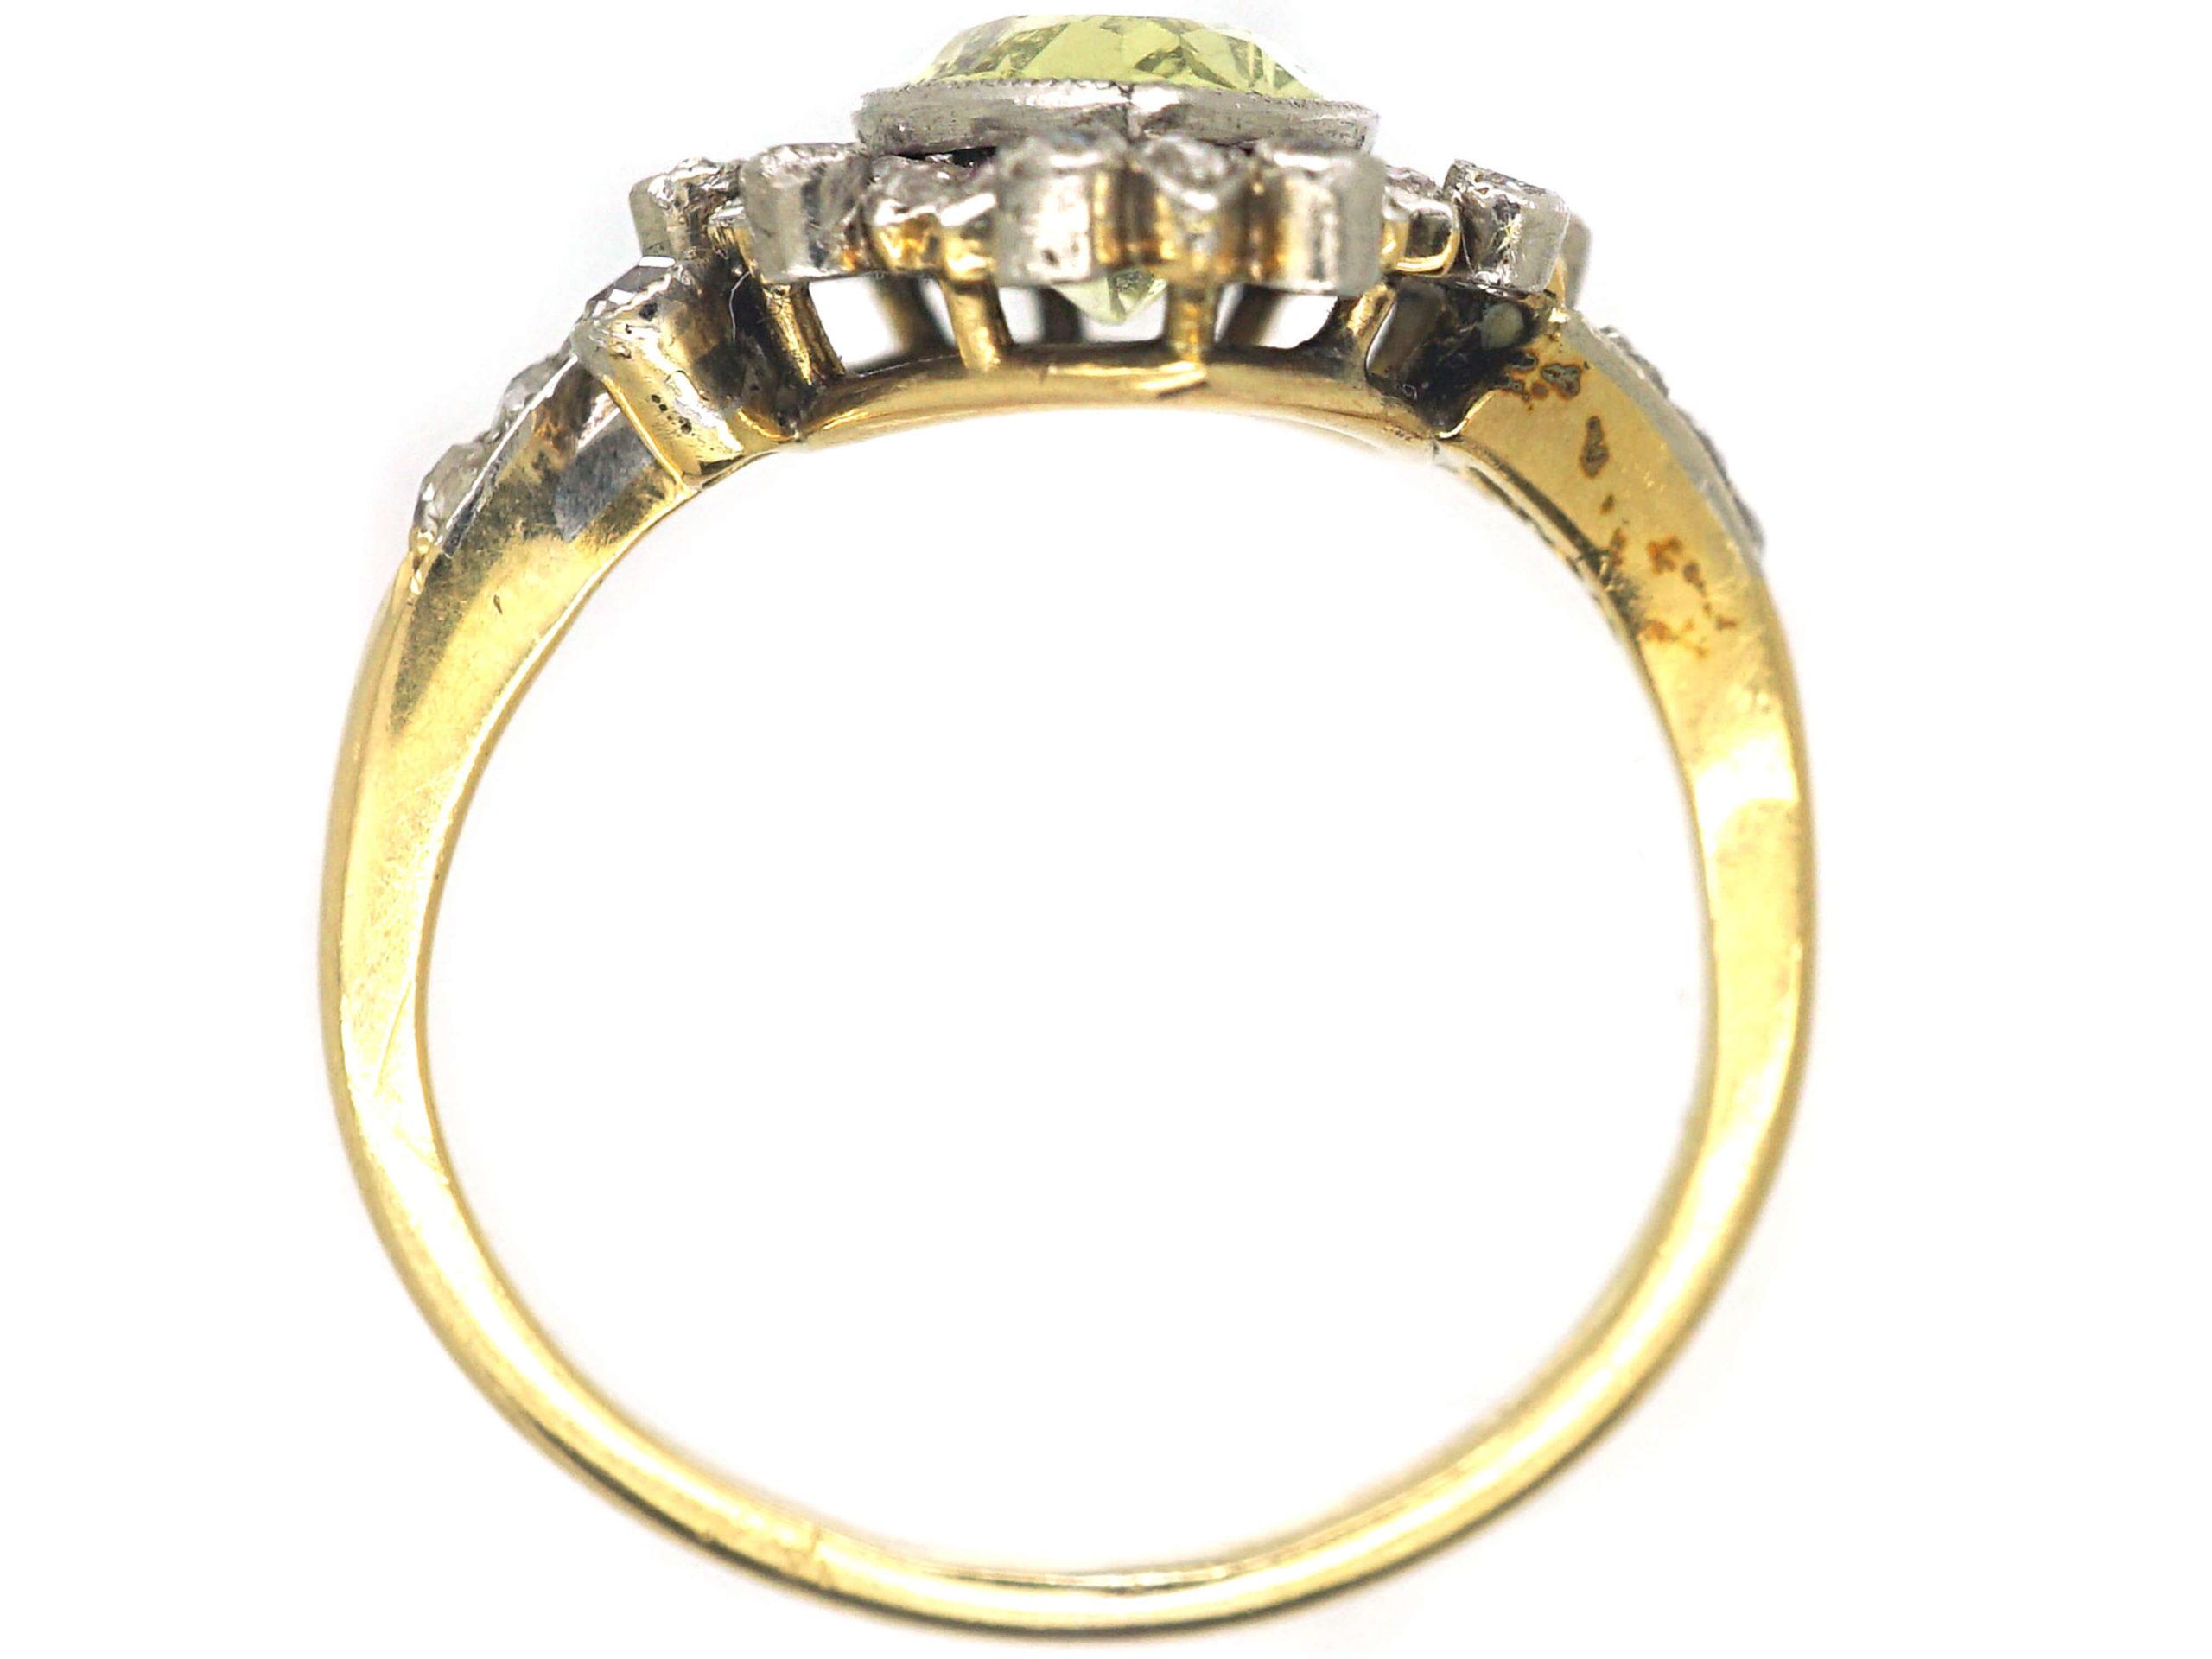 Edwardian 18ct Gold & Platinum, Chrysolite, Diamond & Ruby Ring